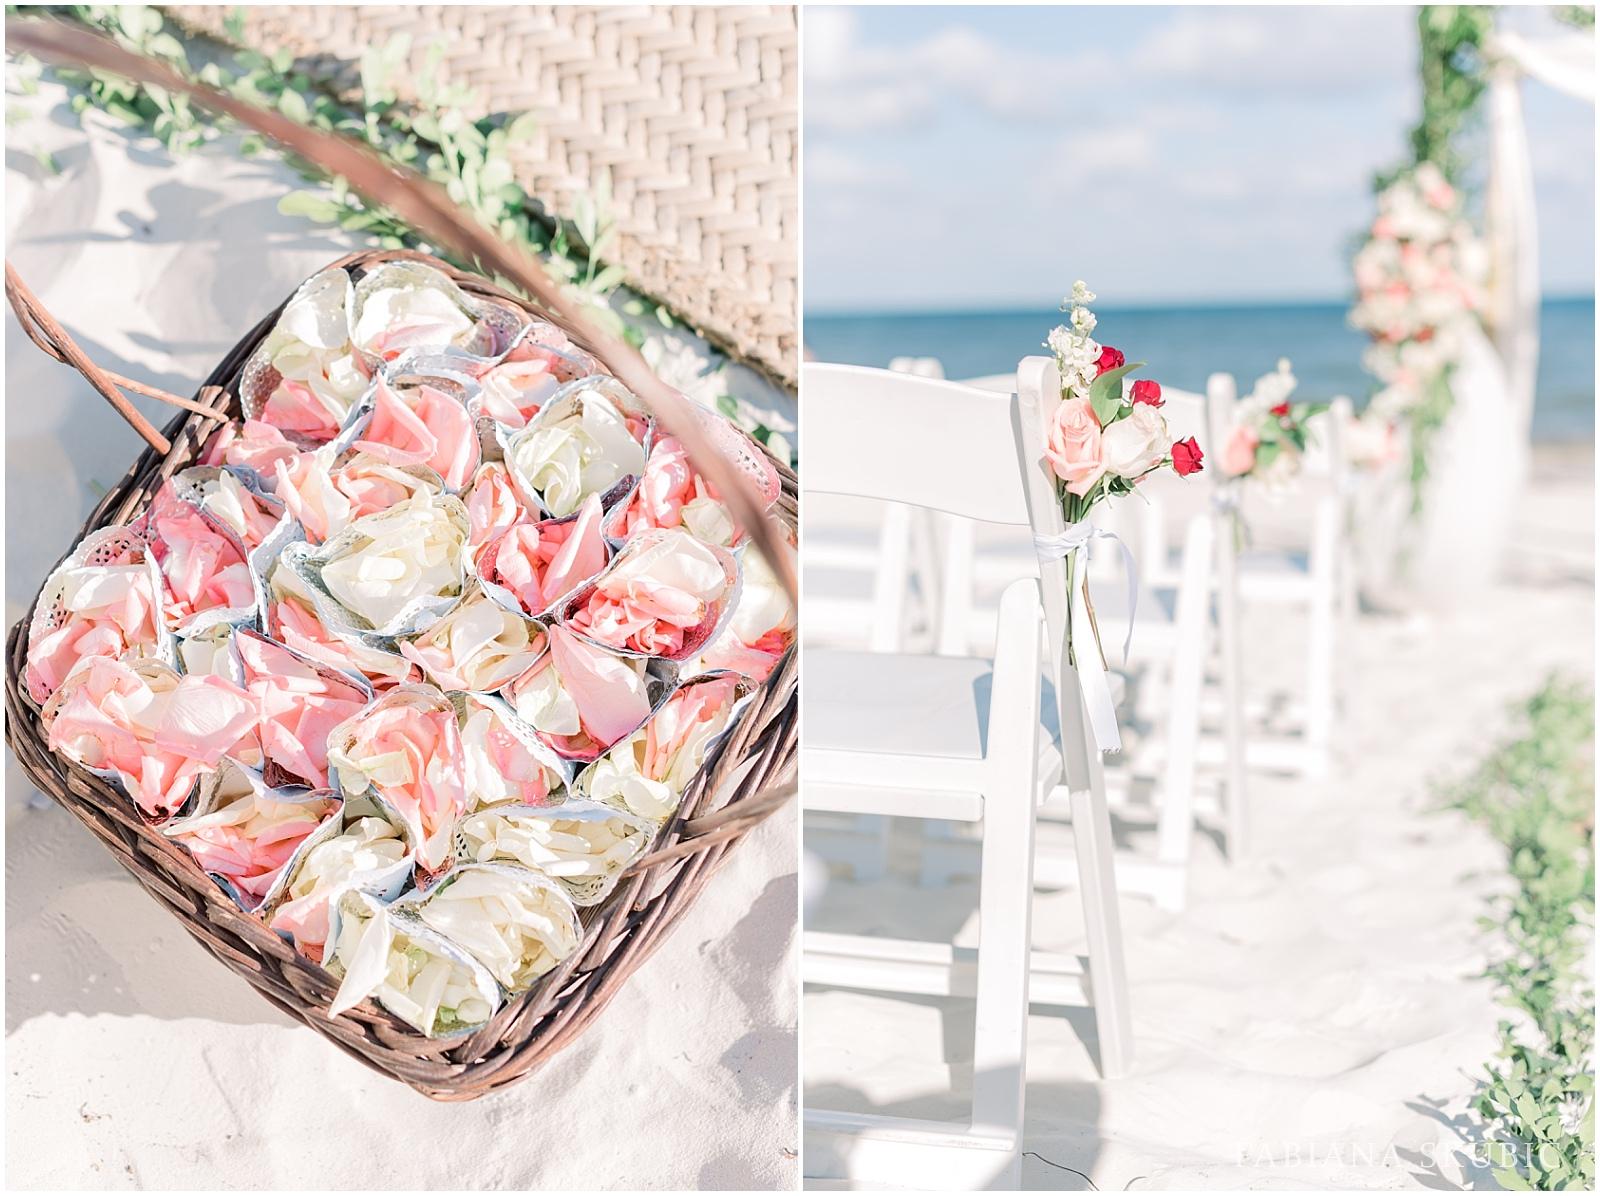 TJ_Now_Sapphire_Riviera_Cancun_Mexico_Wedding_Photos_0221.jpg